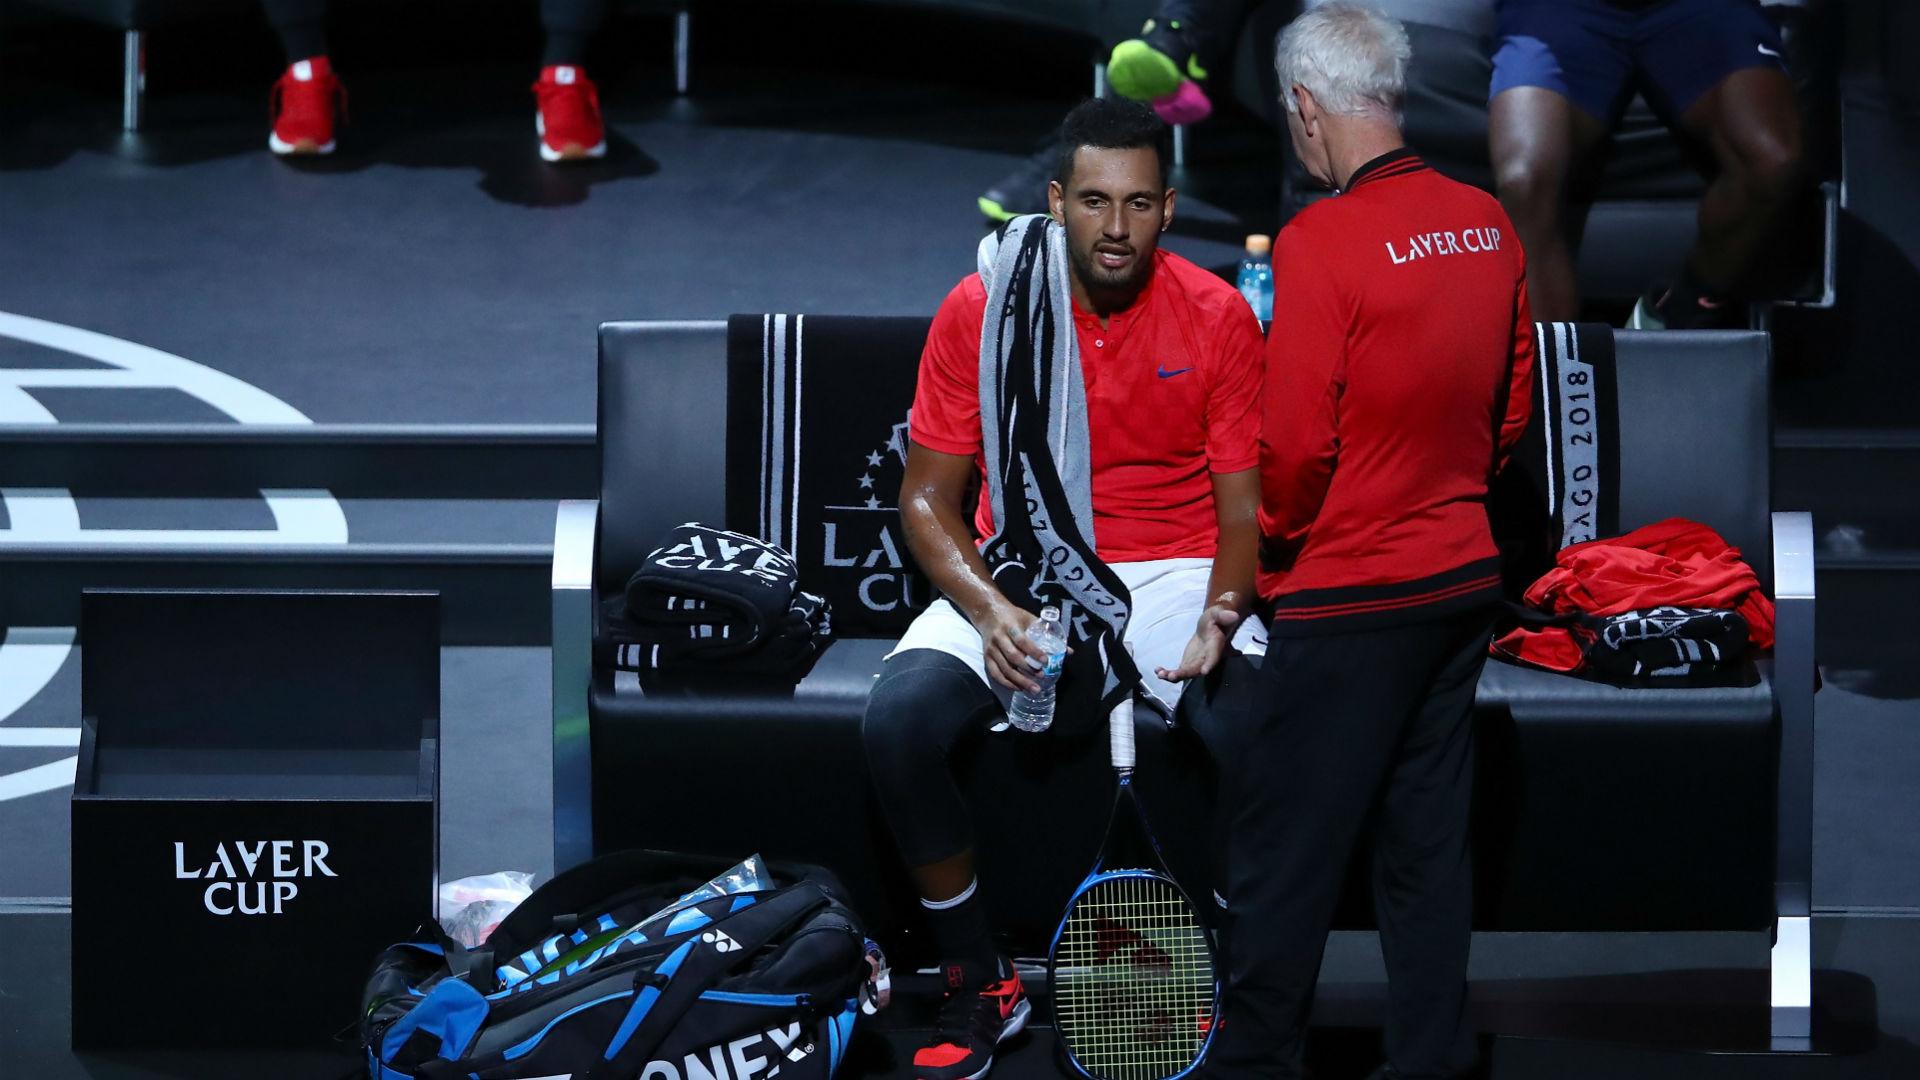 Laver Cup: Roger Federer smashes Nick Kyrgios